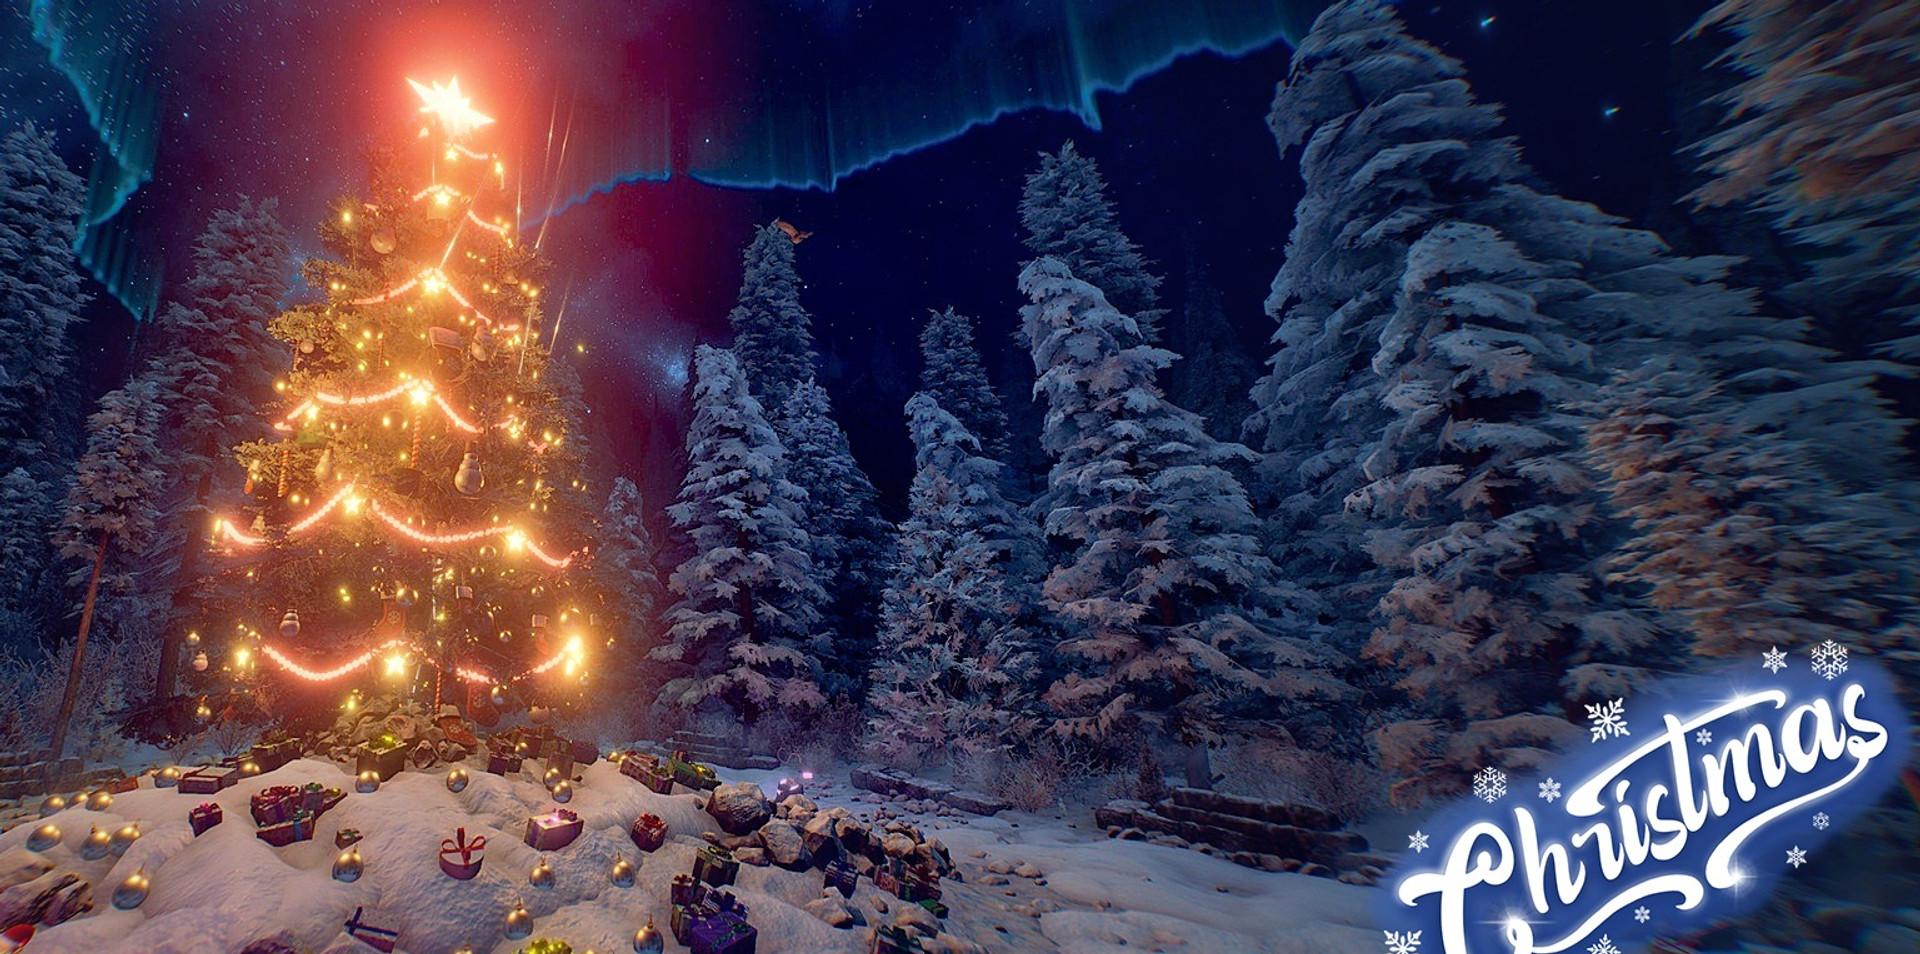 Christmas-story-trailer.mp4